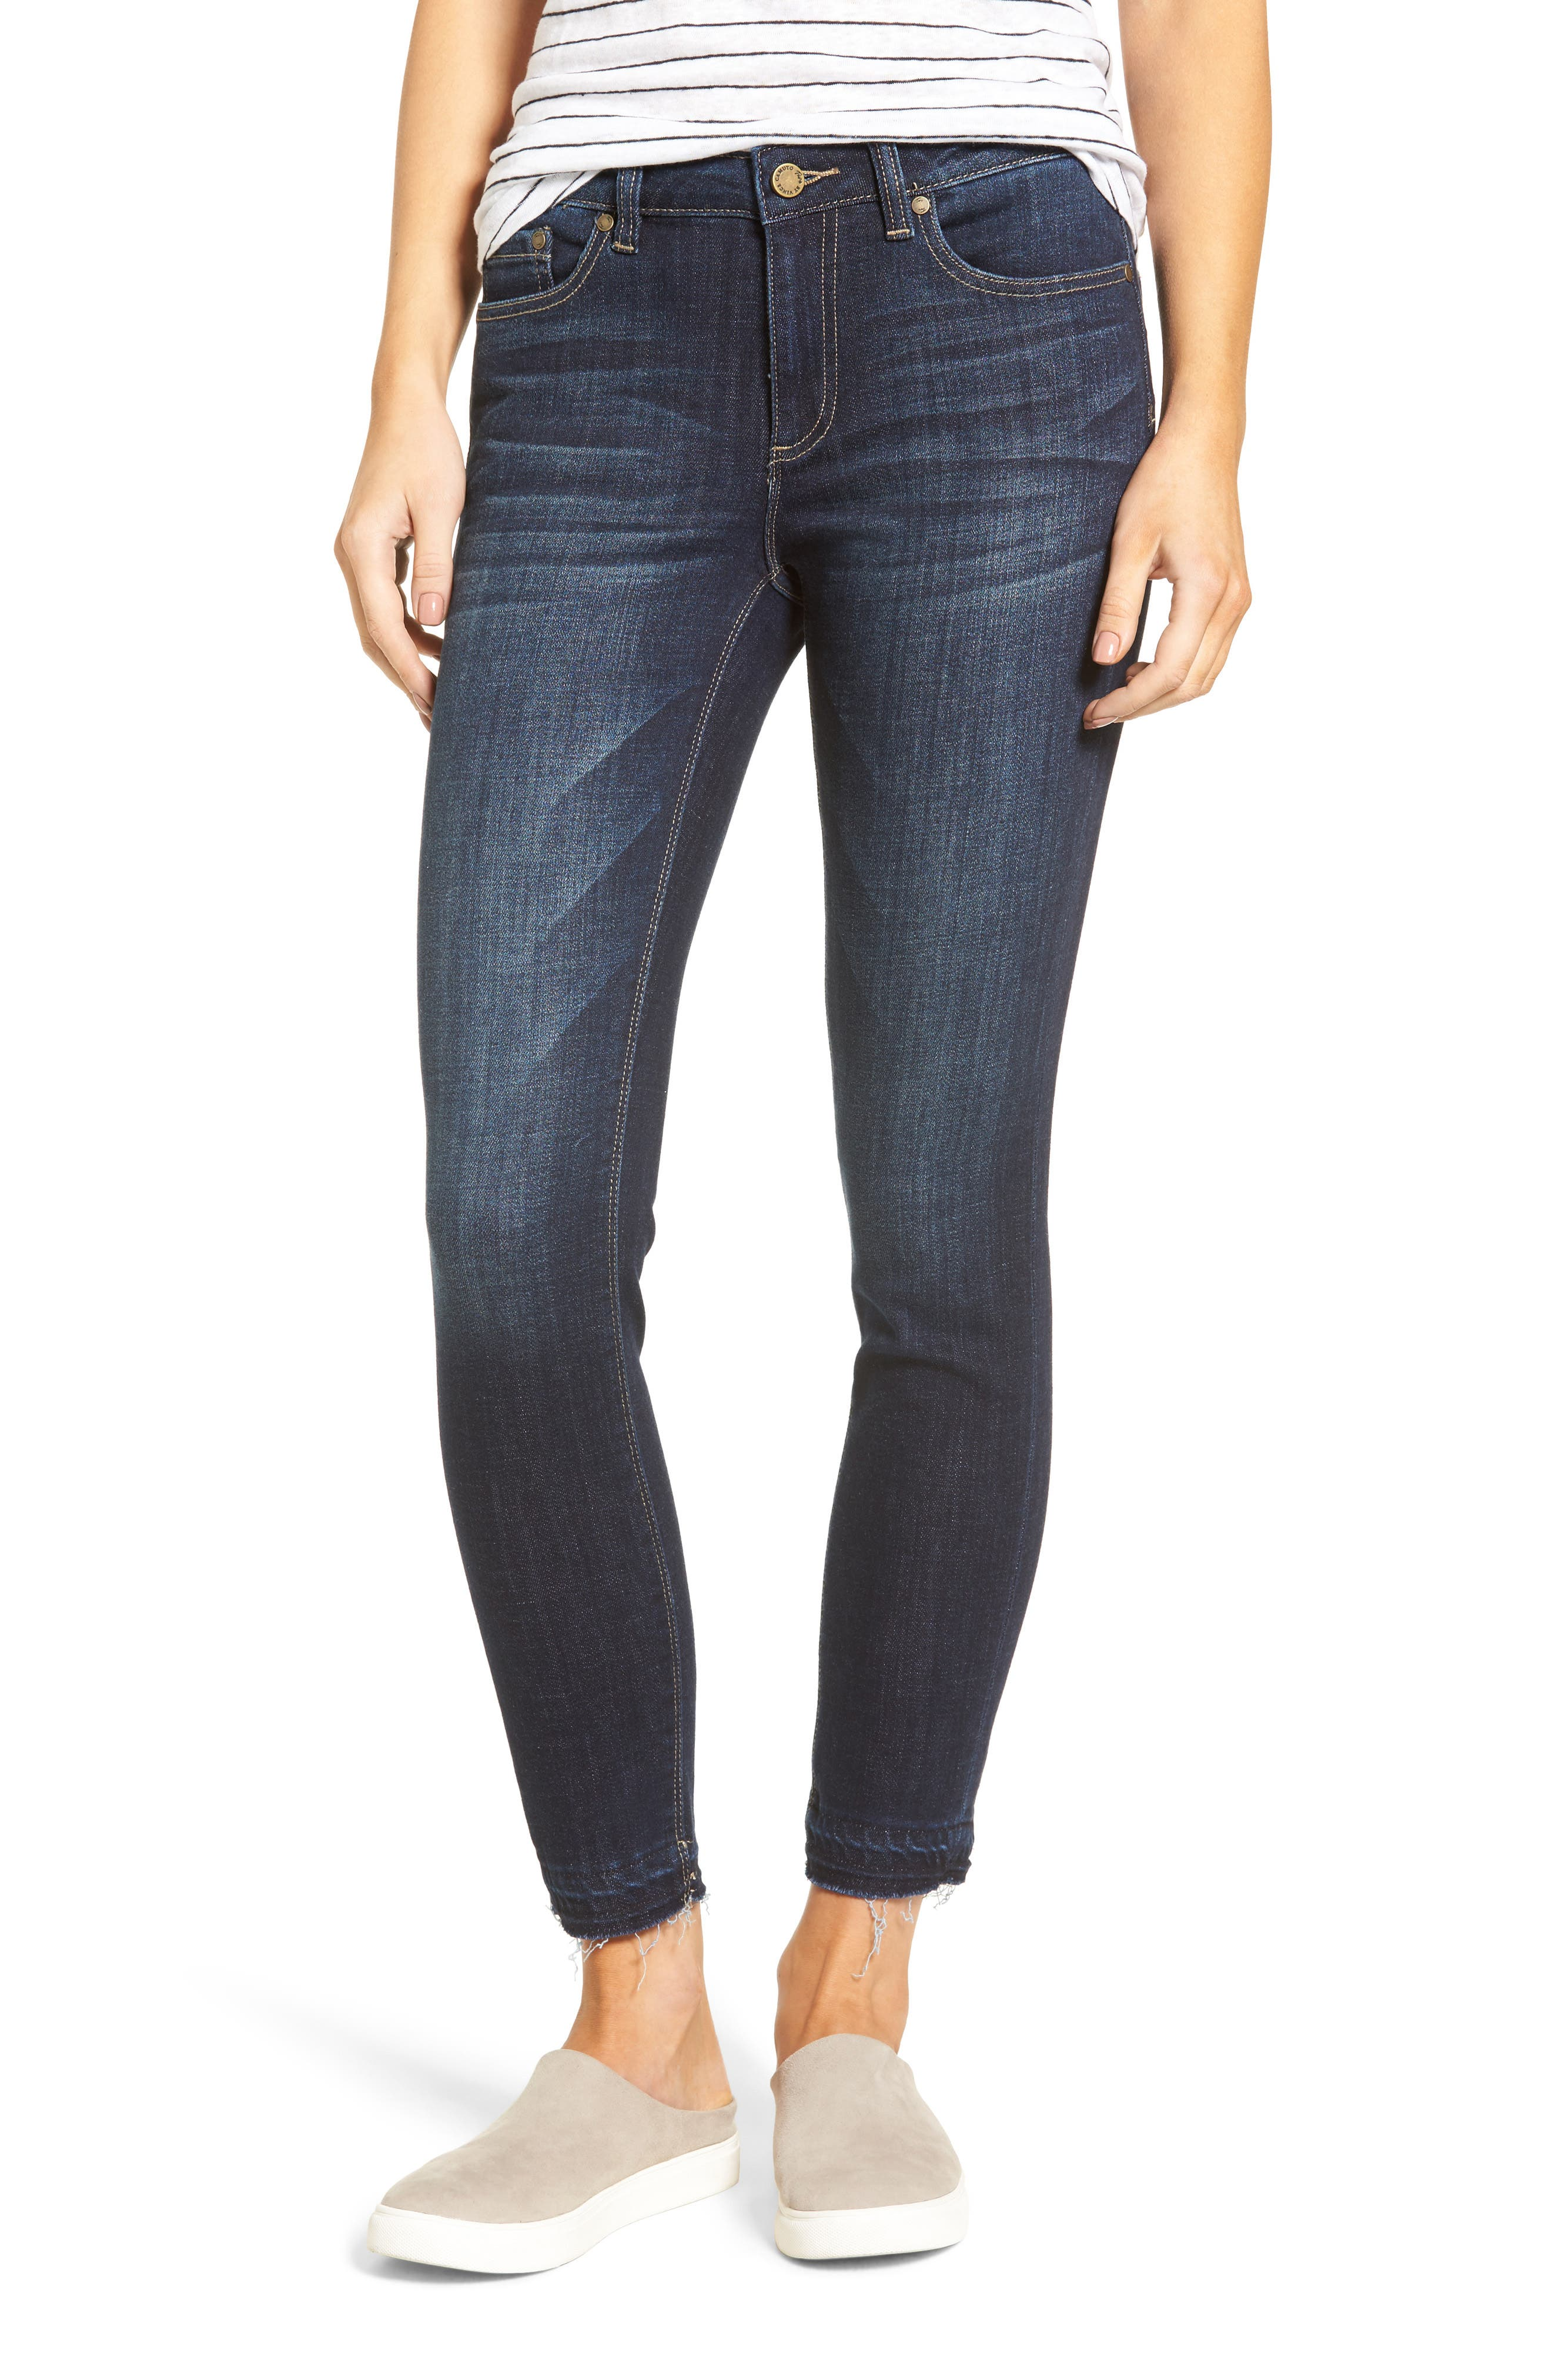 Alternate Image 1 Selected - Vince Camuto Release Hem Skinny Jeans (Regular & Petite)